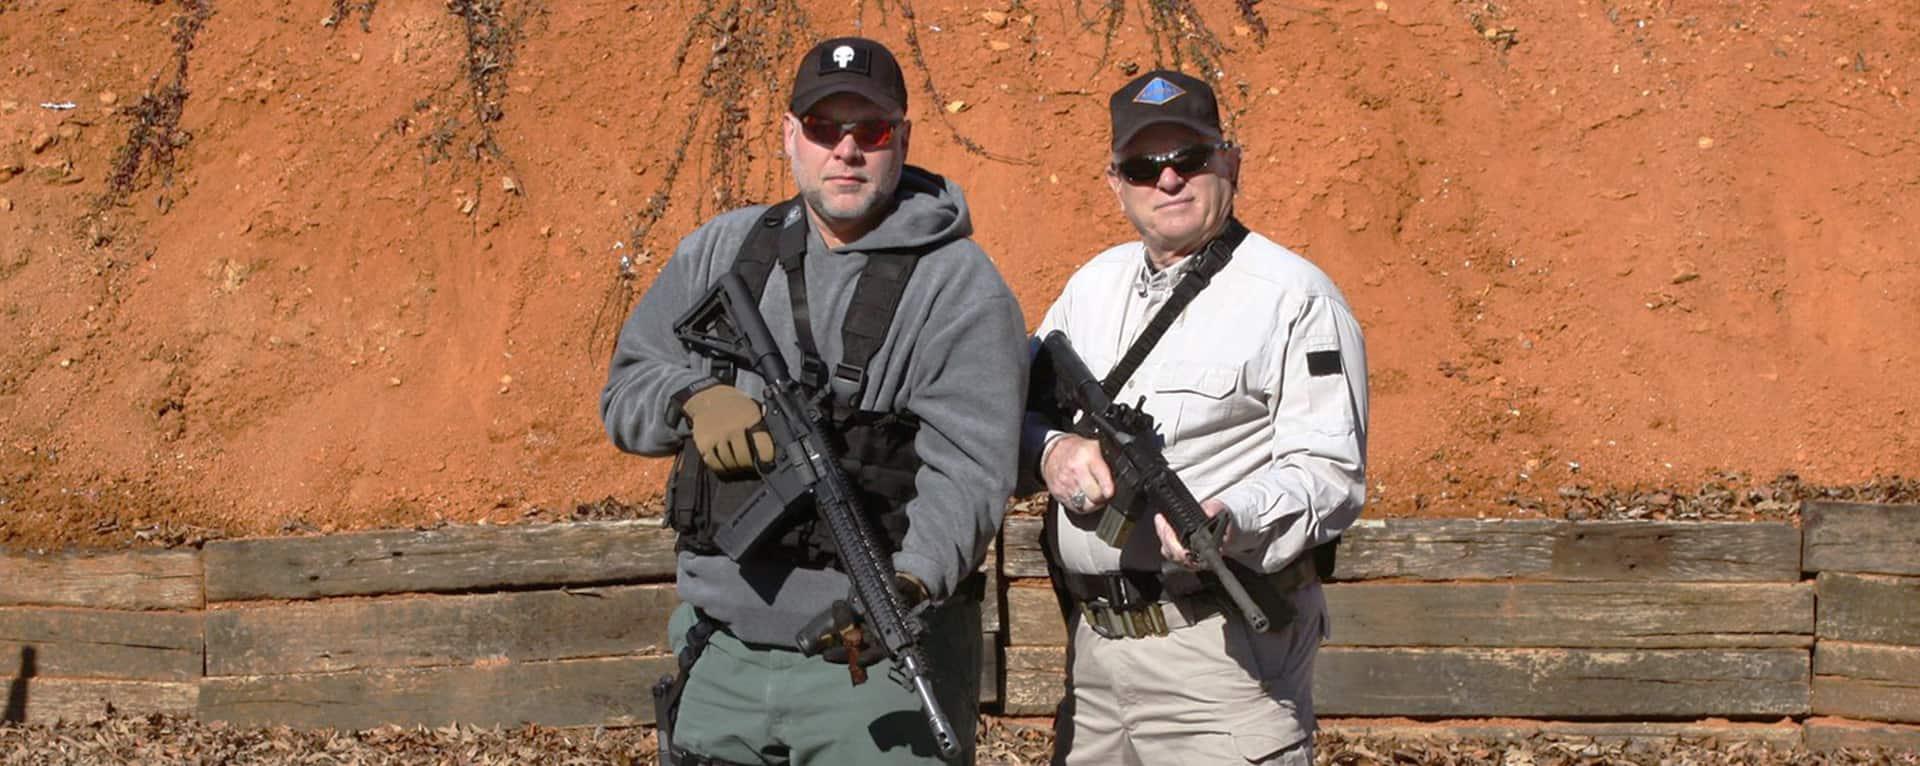 Handgun Training   Morrison Tactical   Bristol, Johnson City & Kingsport, TN